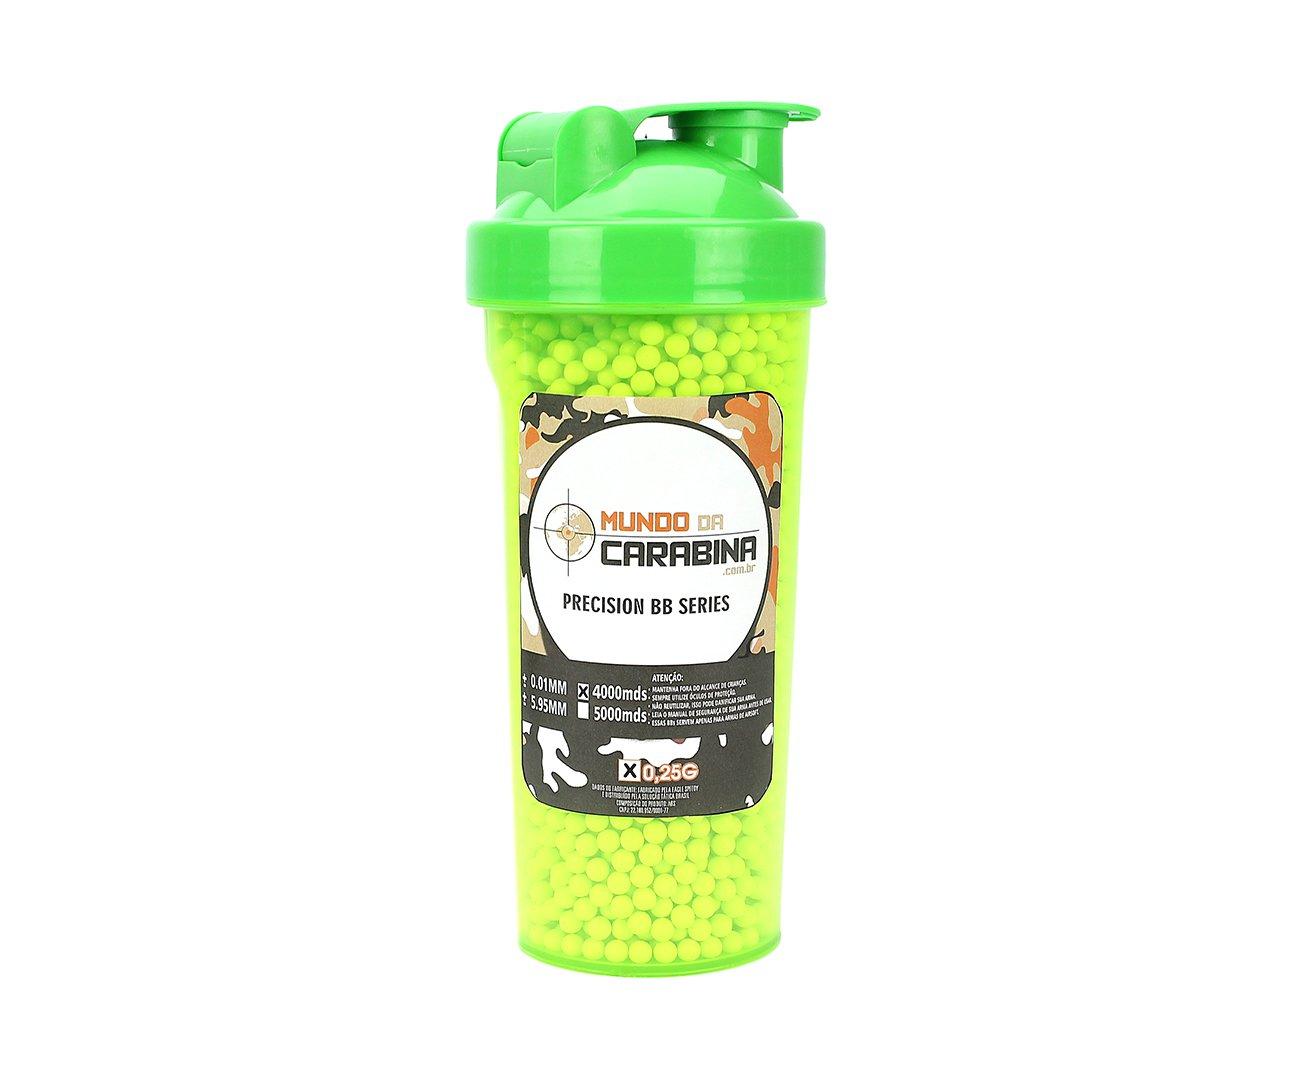 Esfera Plástica Premium Munda Da Carabina 0,25g Squeeze Plástico Verde Com 4000 Unid